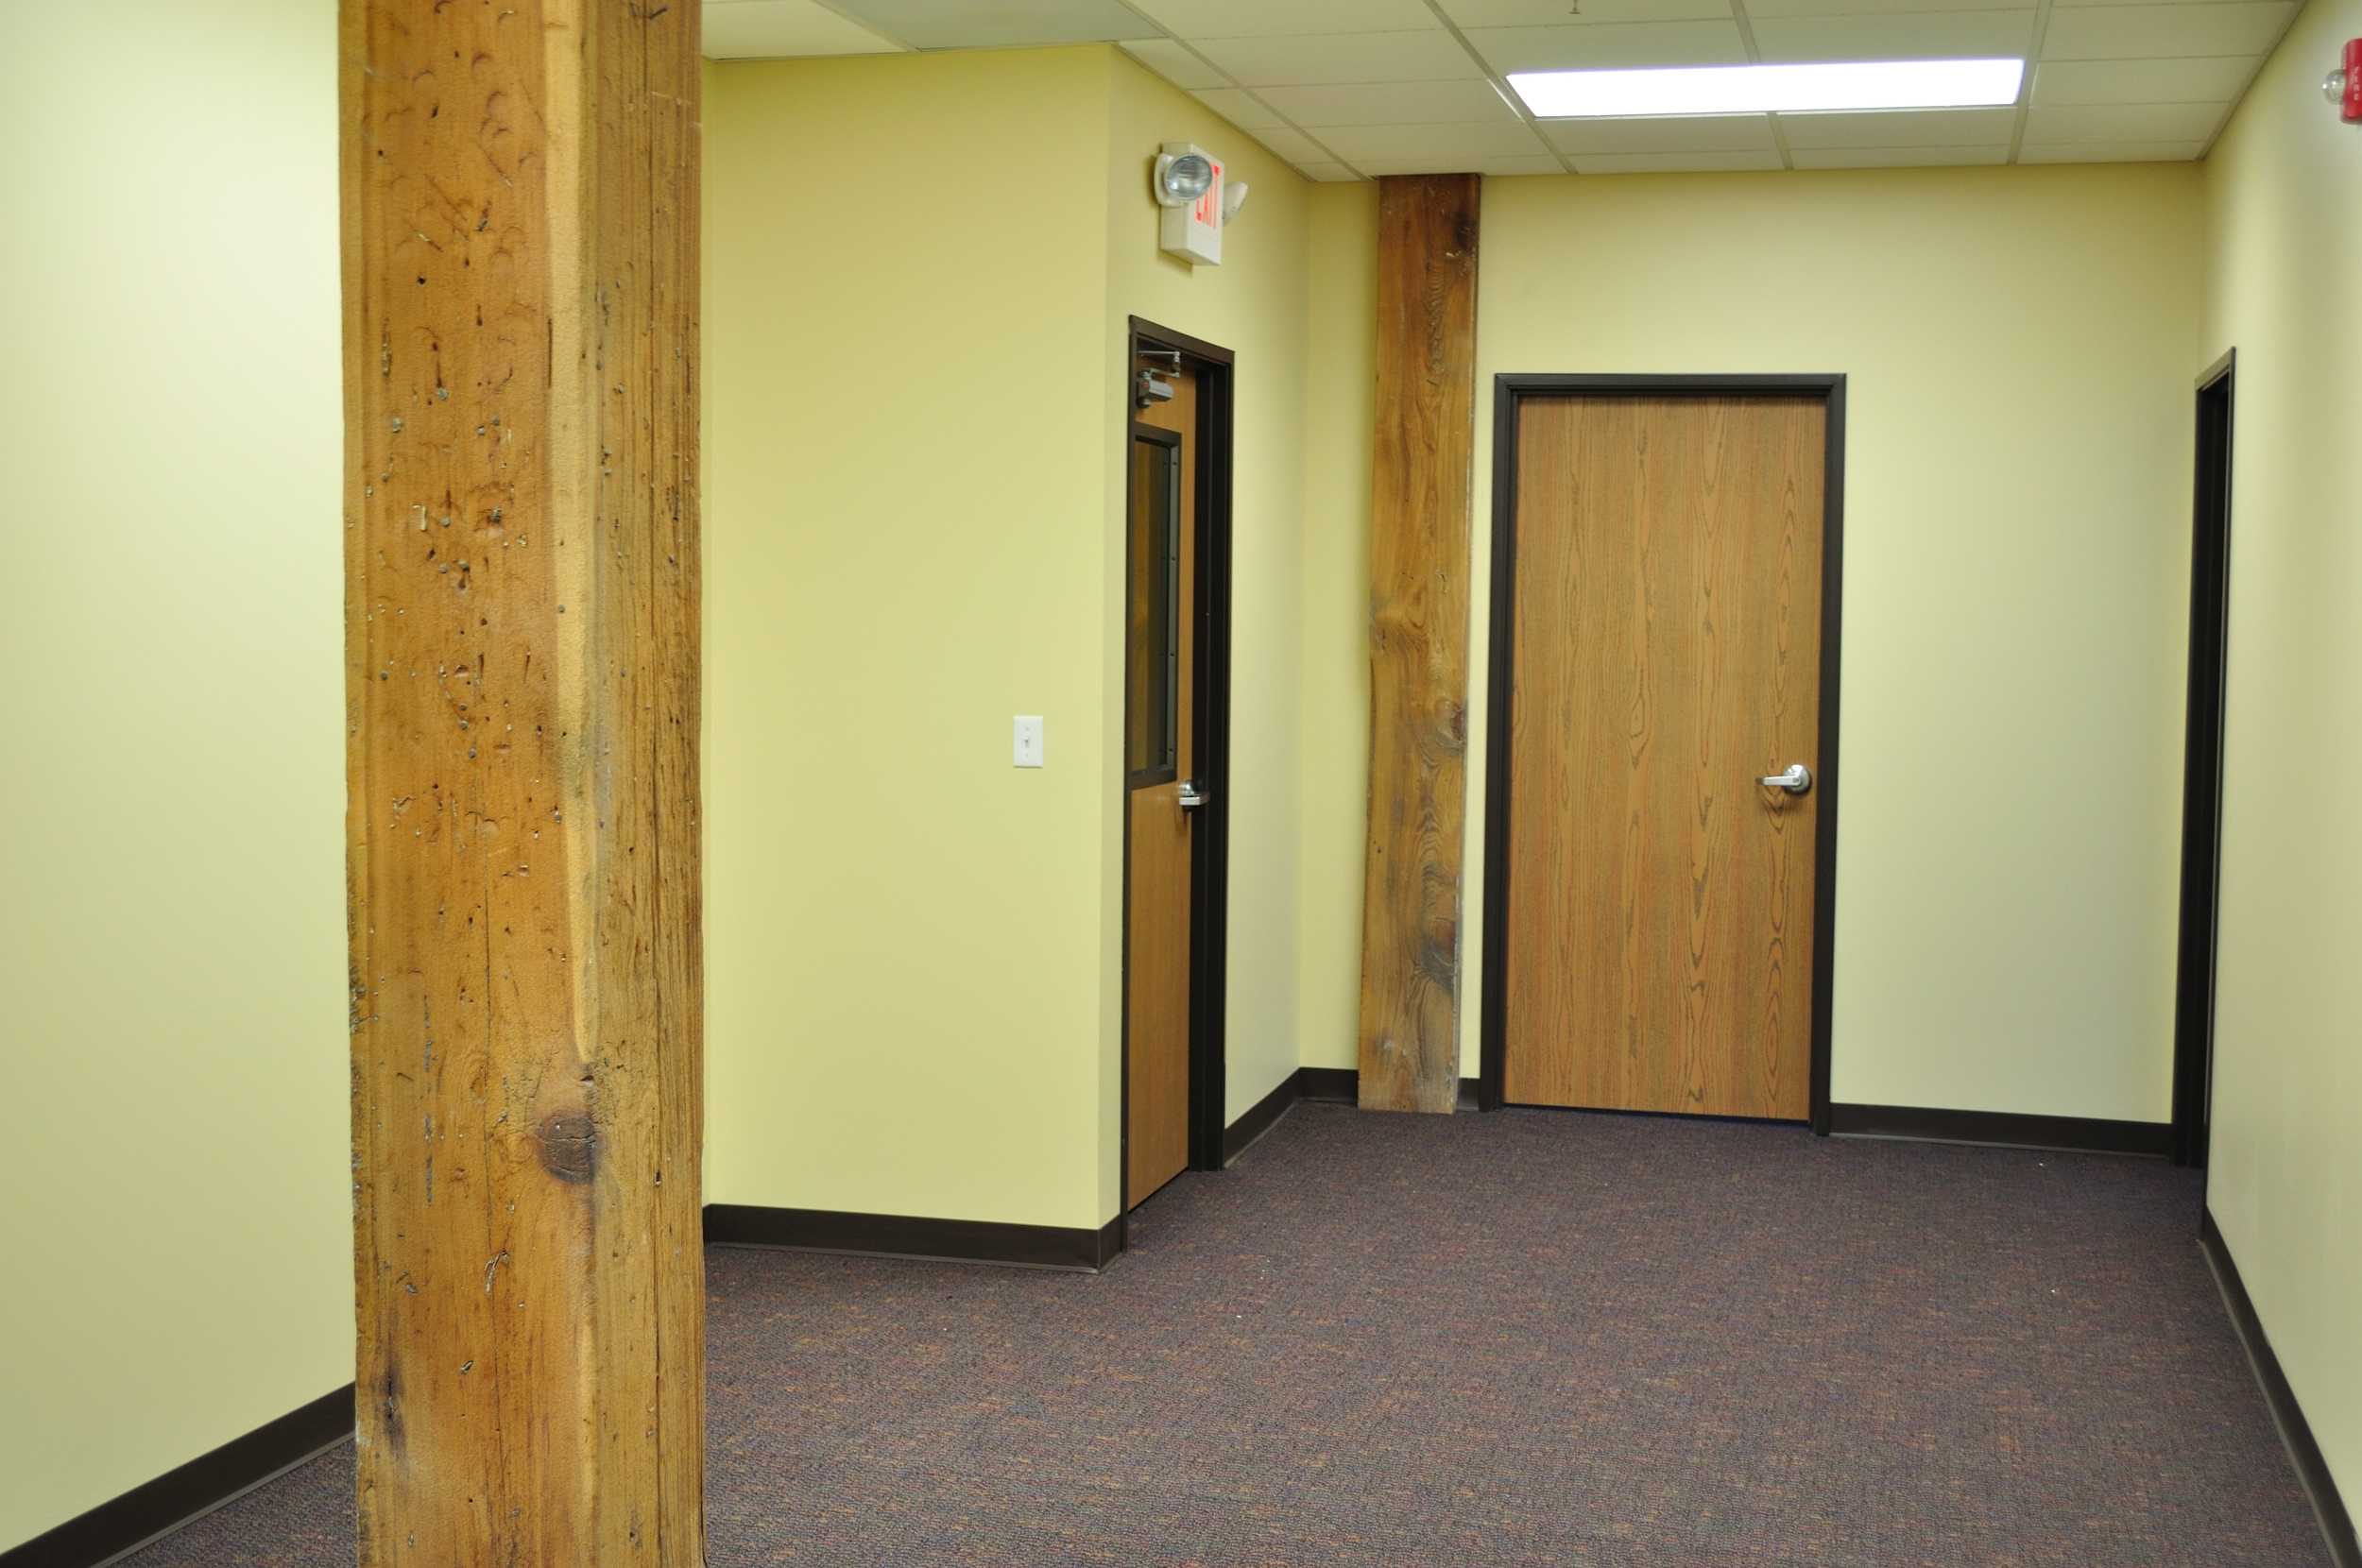 Hallway Yellow.JPG